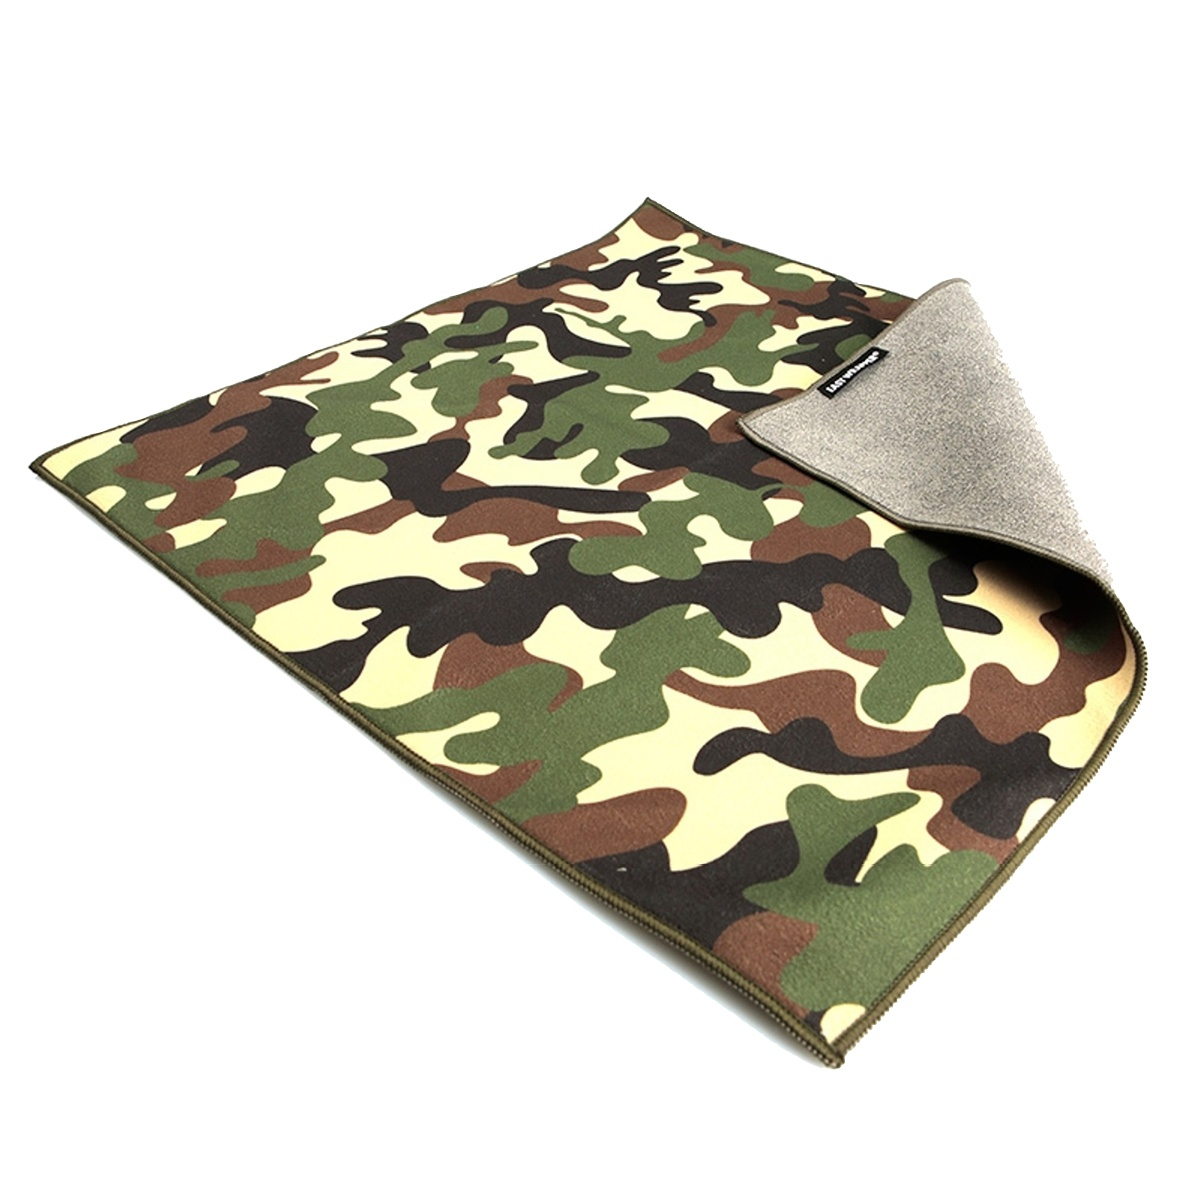 Einschlagtuch Easy Wrapper (M) Camouflage